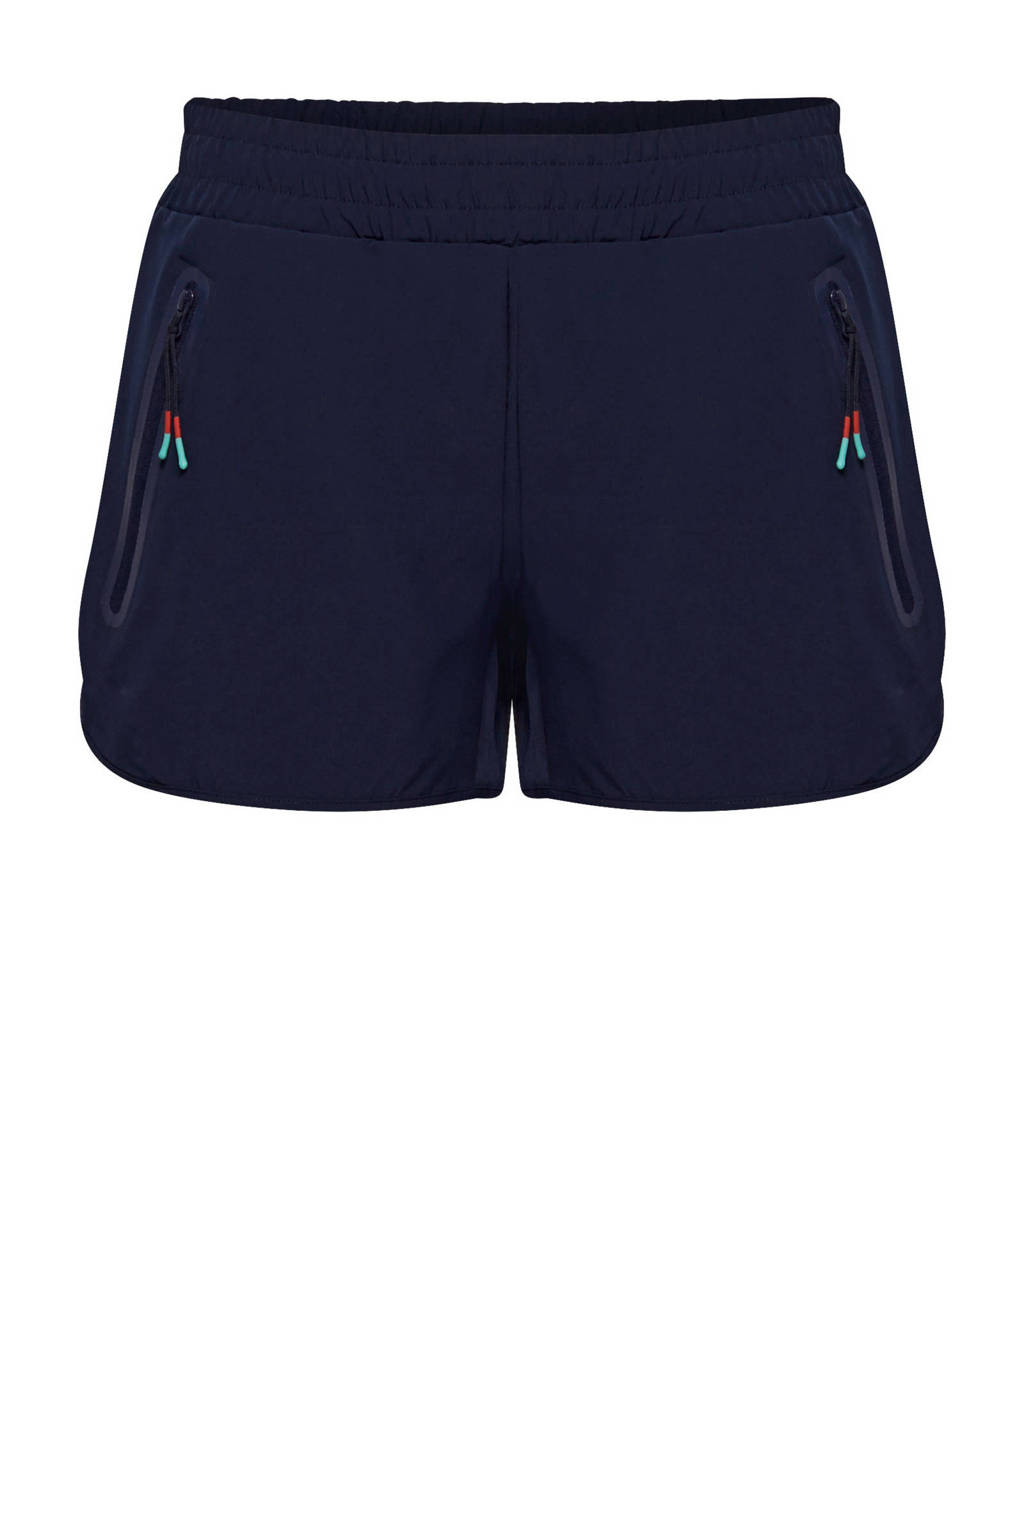 ESPRIT Women Sports short donkerblauw, Donkerblauw